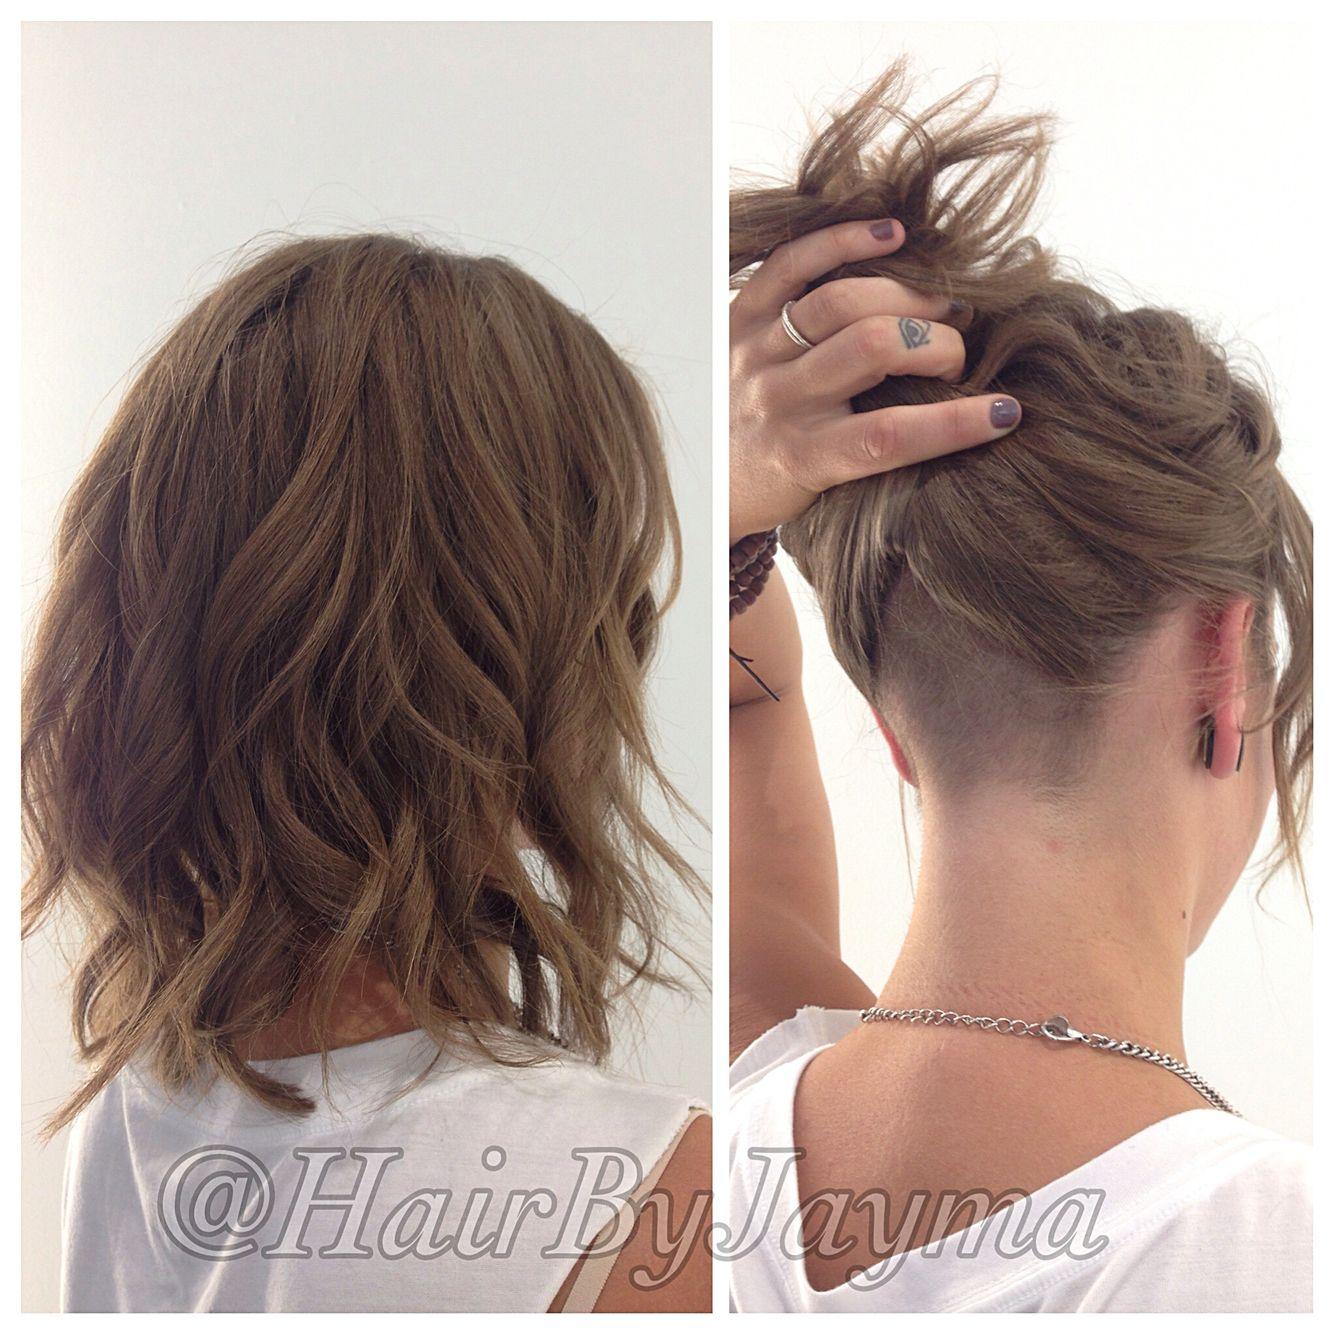 Wavy Bob And Undercut Hairbyjayma Undercut Long Hair Haircuts For Fine Hair Wavy Bob Haircuts